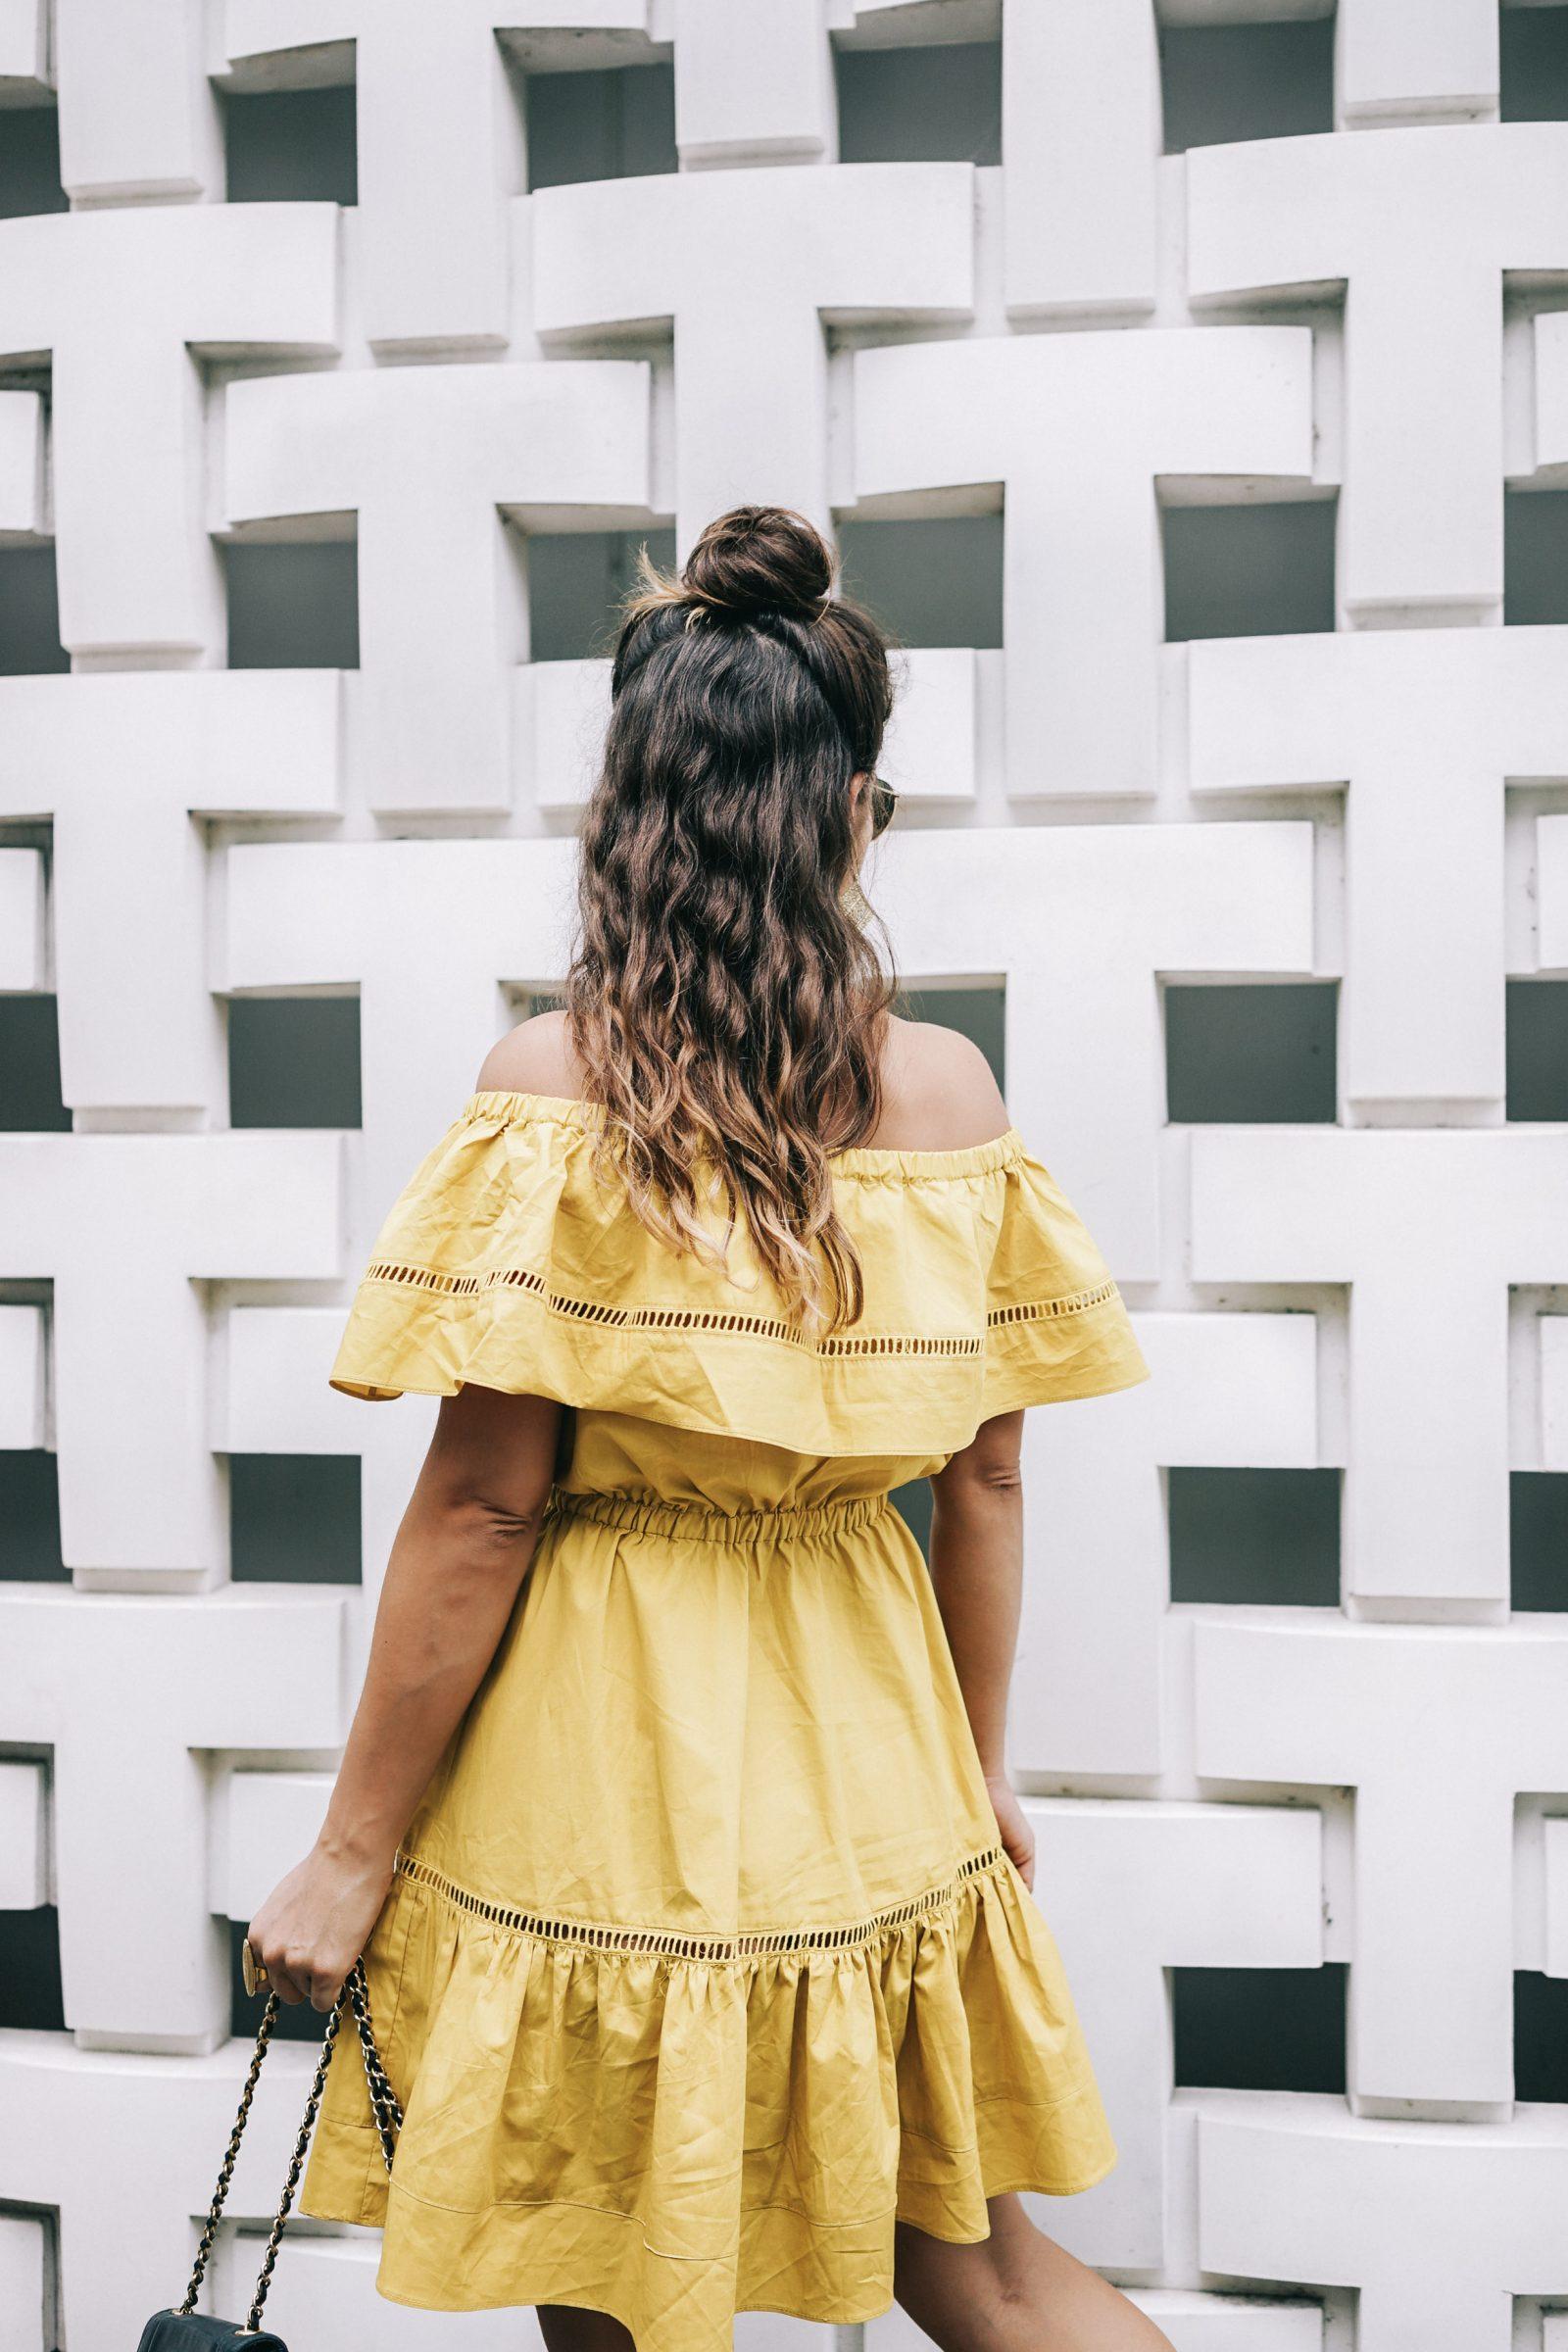 tokyo_travel_guide-outfit-collage_vintage-street_style-off_the_shoulders_dress-mustard_dress-soludos_sandals-chanel_vintage-bag-vintage_stores-52